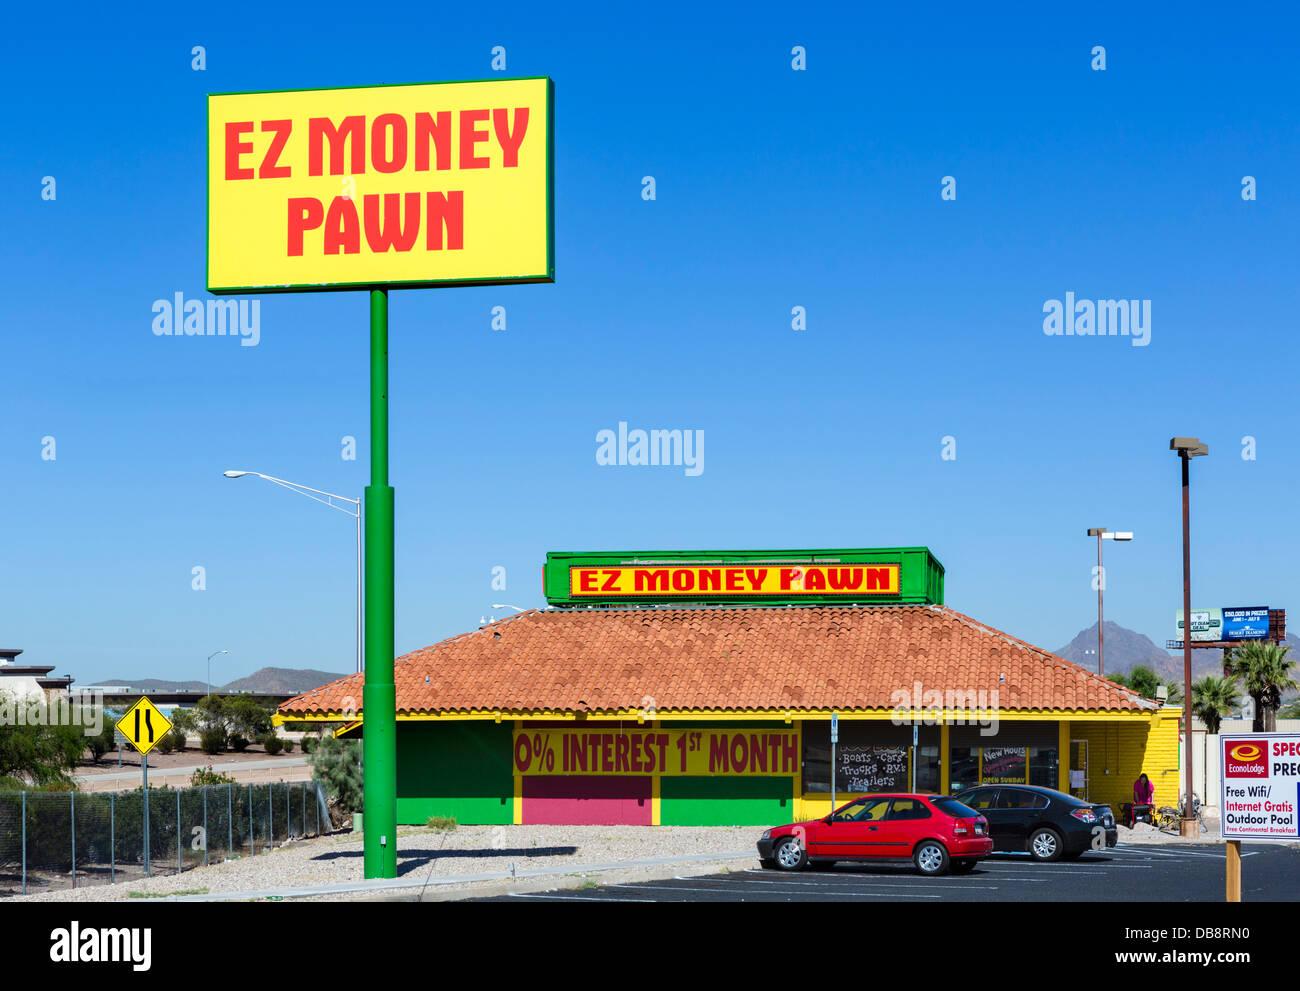 EZ denaro pedina negozio in Tucson, Arizona, Stati Uniti d'America Immagini Stock